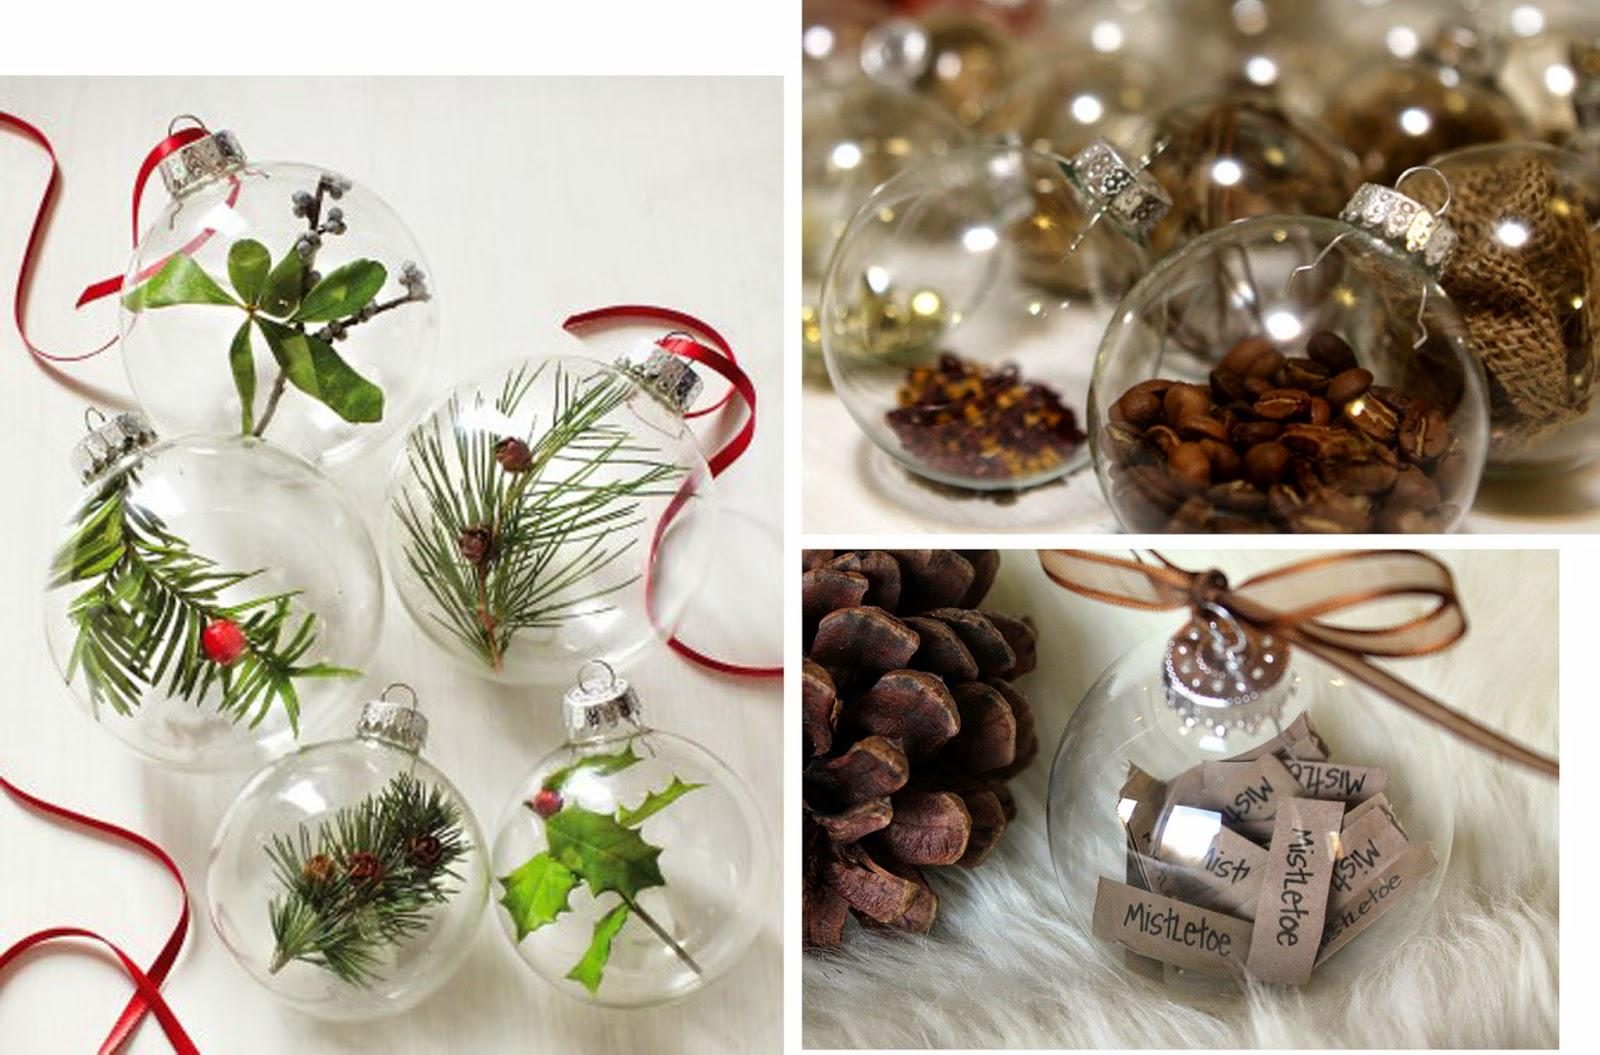 atelier taller de espacios, decoración navideña, adornos de navidad, diseño de interiores guatemala, decoración navideña, decoración guatemala